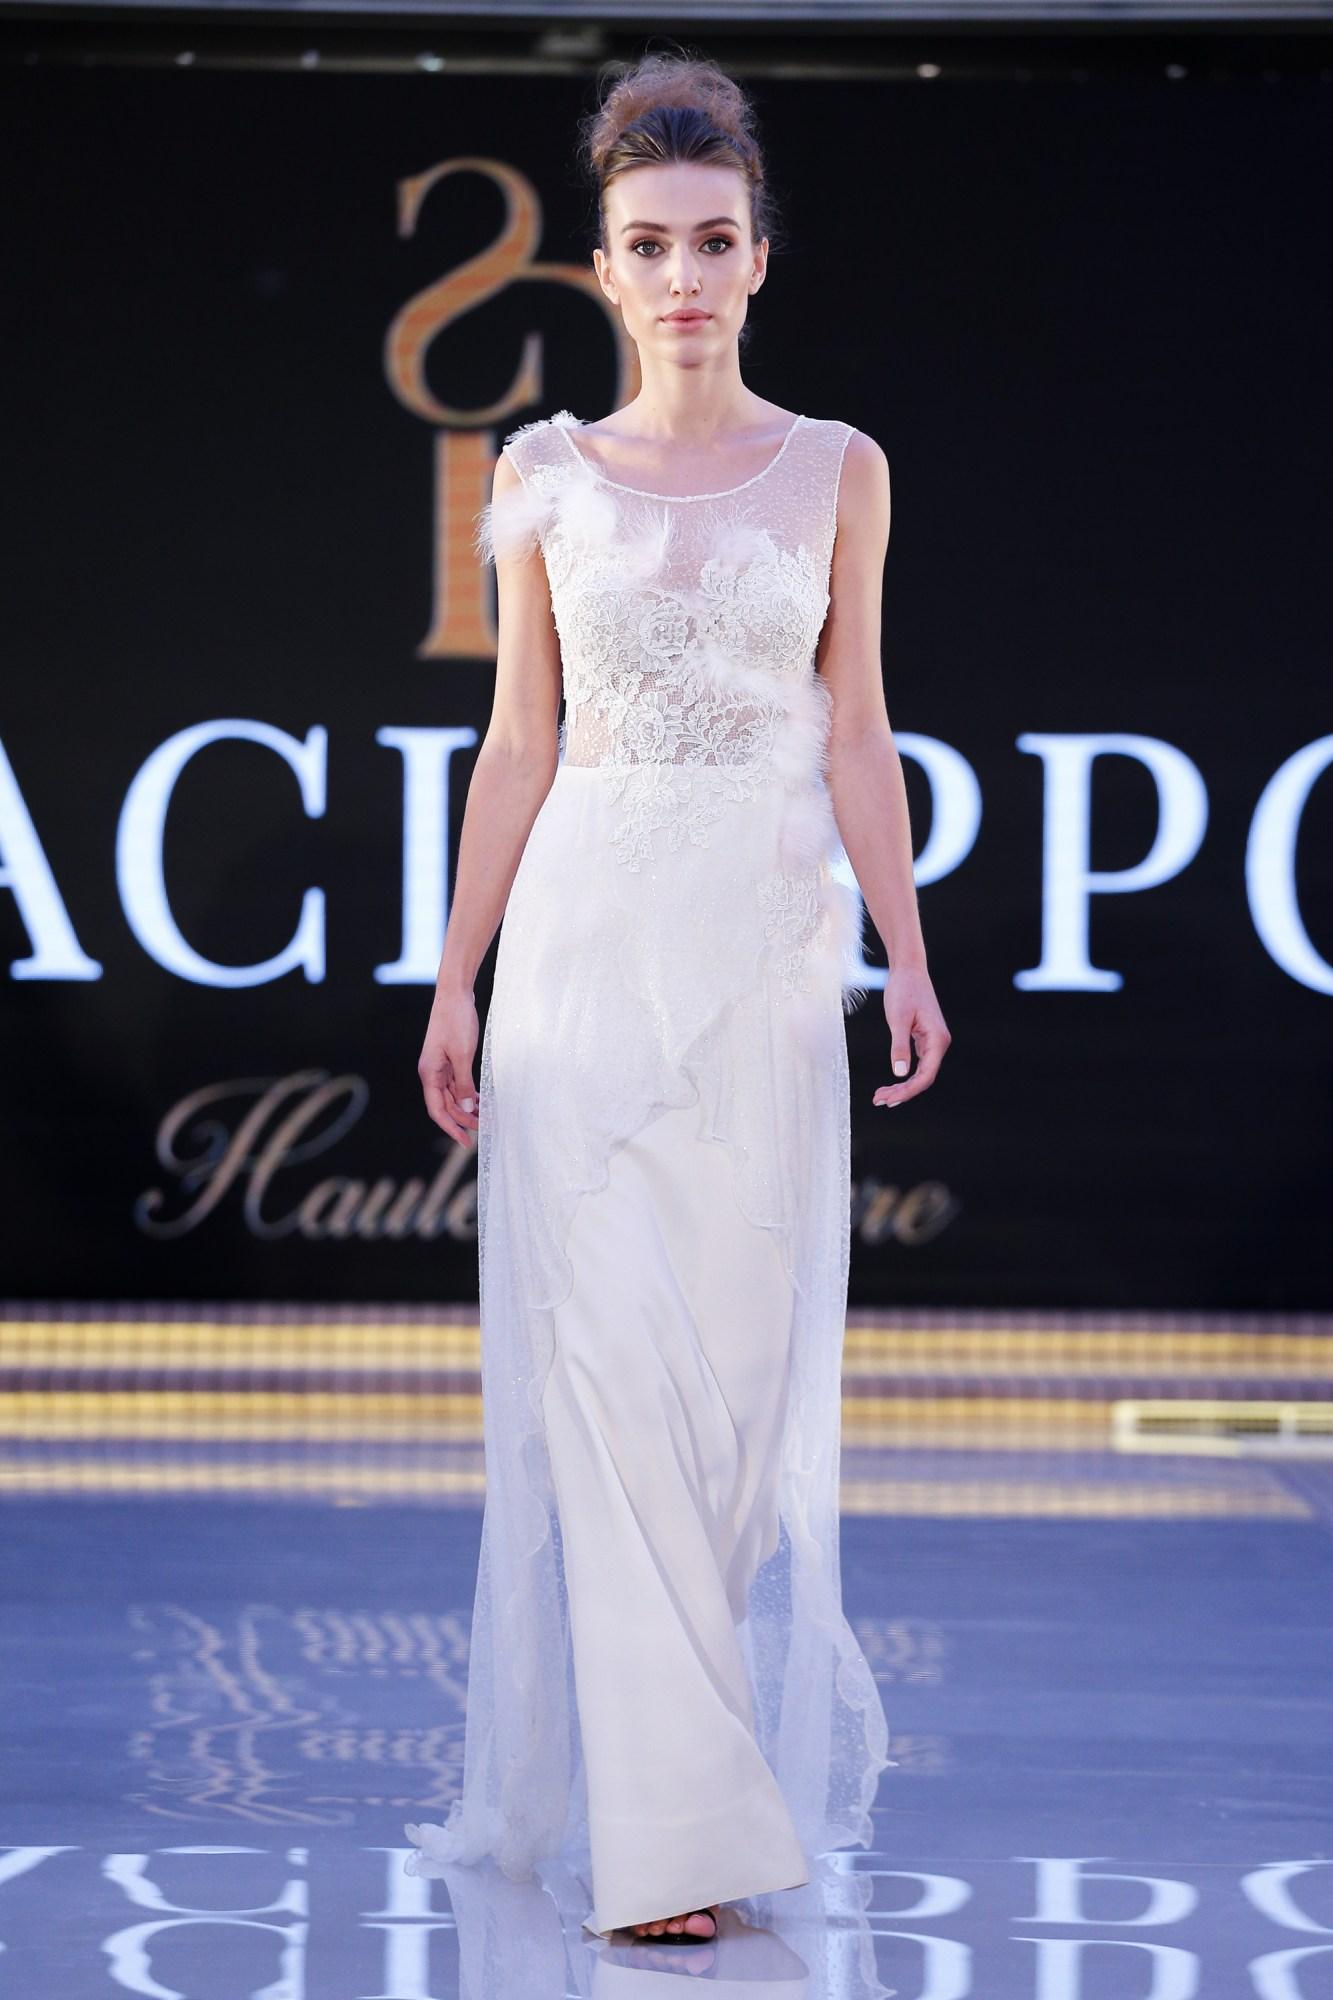 Simone Racioppo Ready Couture Fall Winter 2018 Collection Dubai Fashion Week